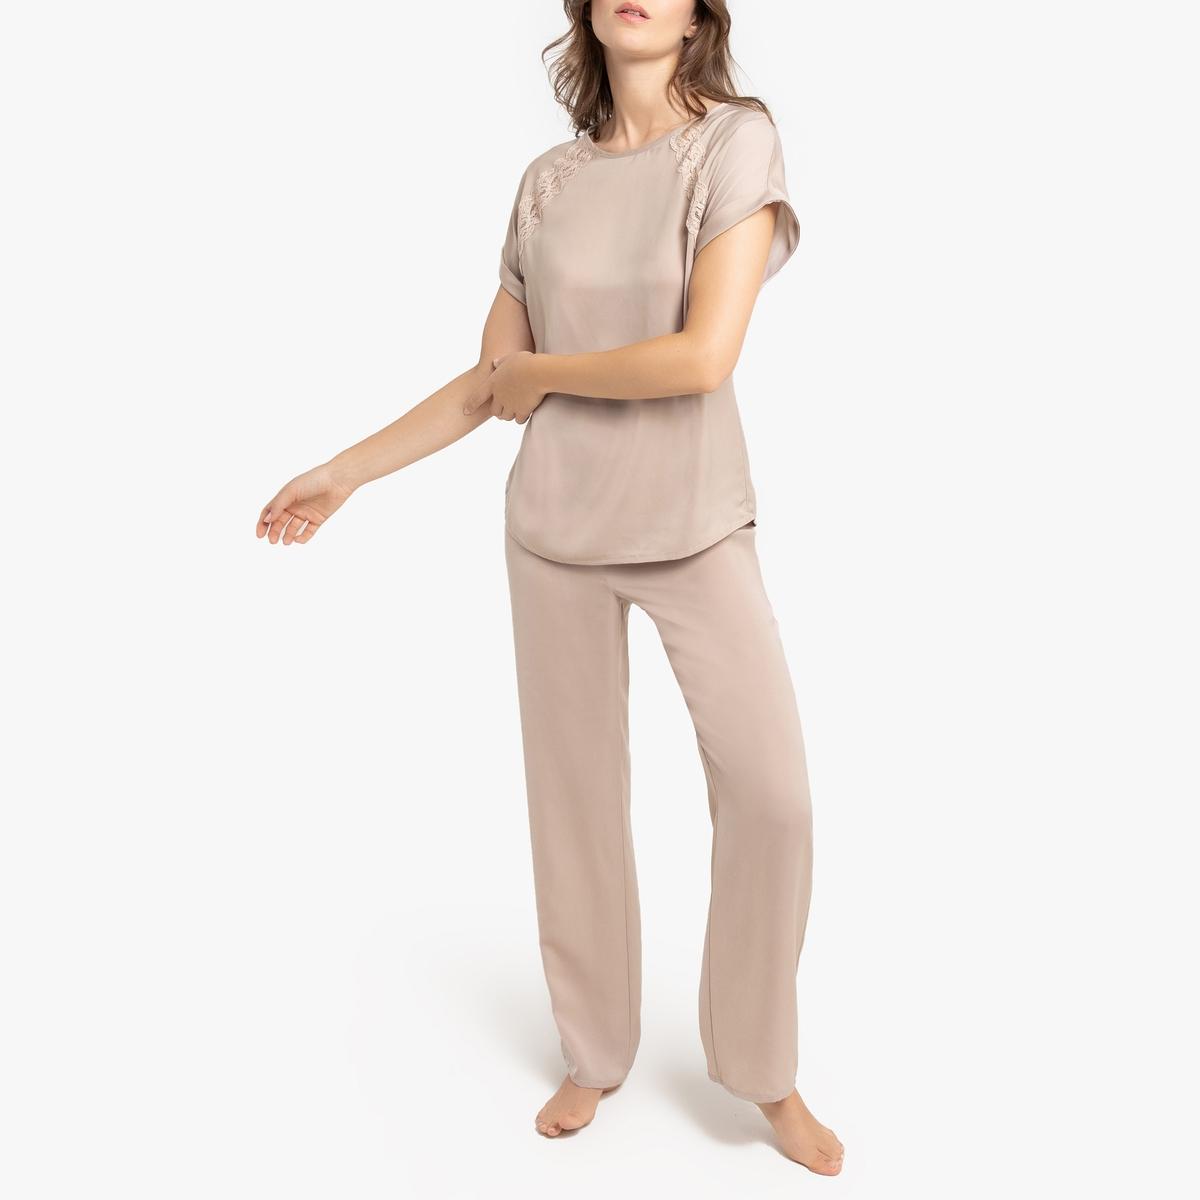 Pijama de satén con detalles de encaje